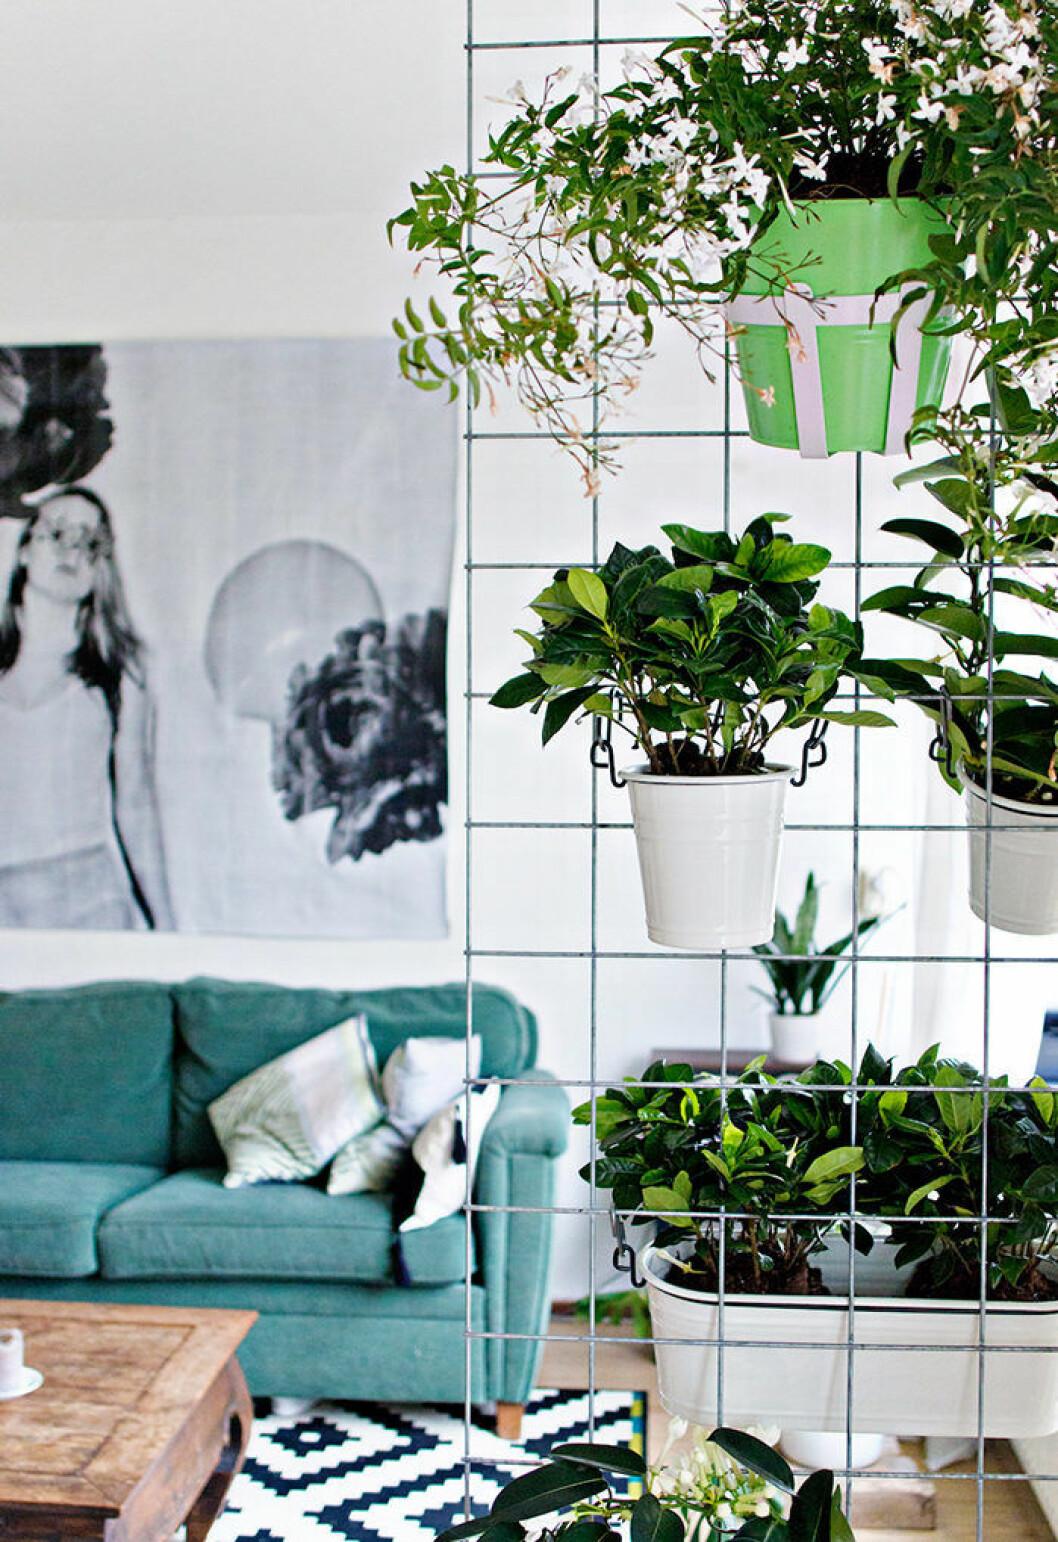 Inred med en minimalistisk spaljé inomhus